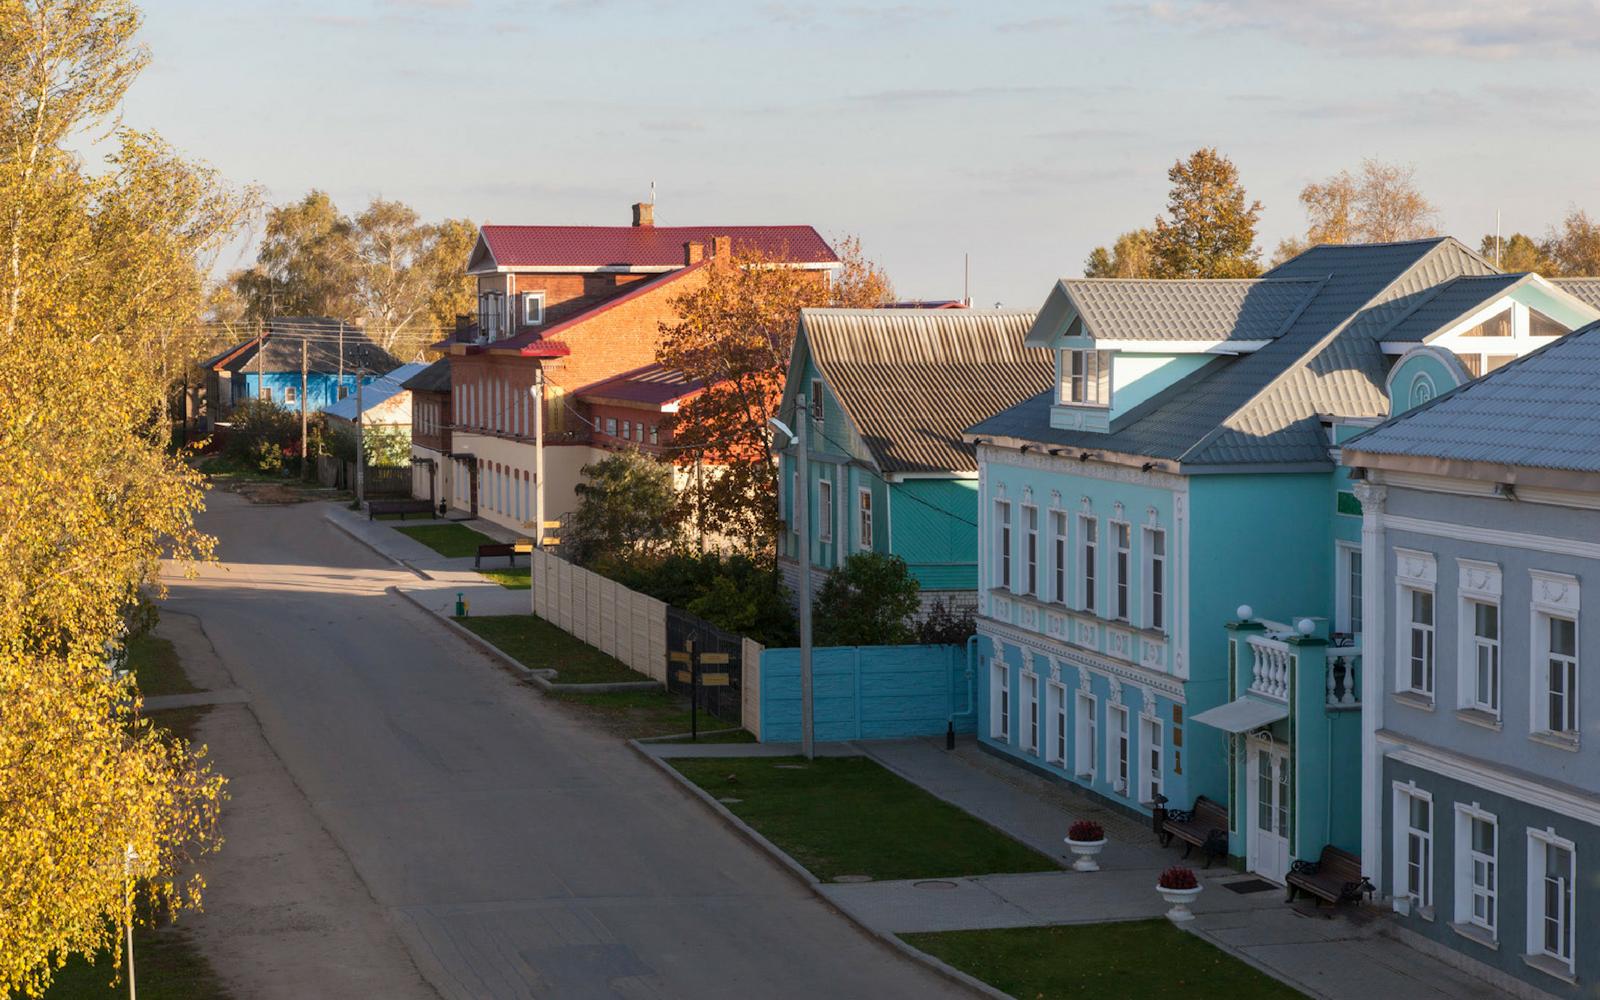 все фото села вятское ярославской обл голубой волне